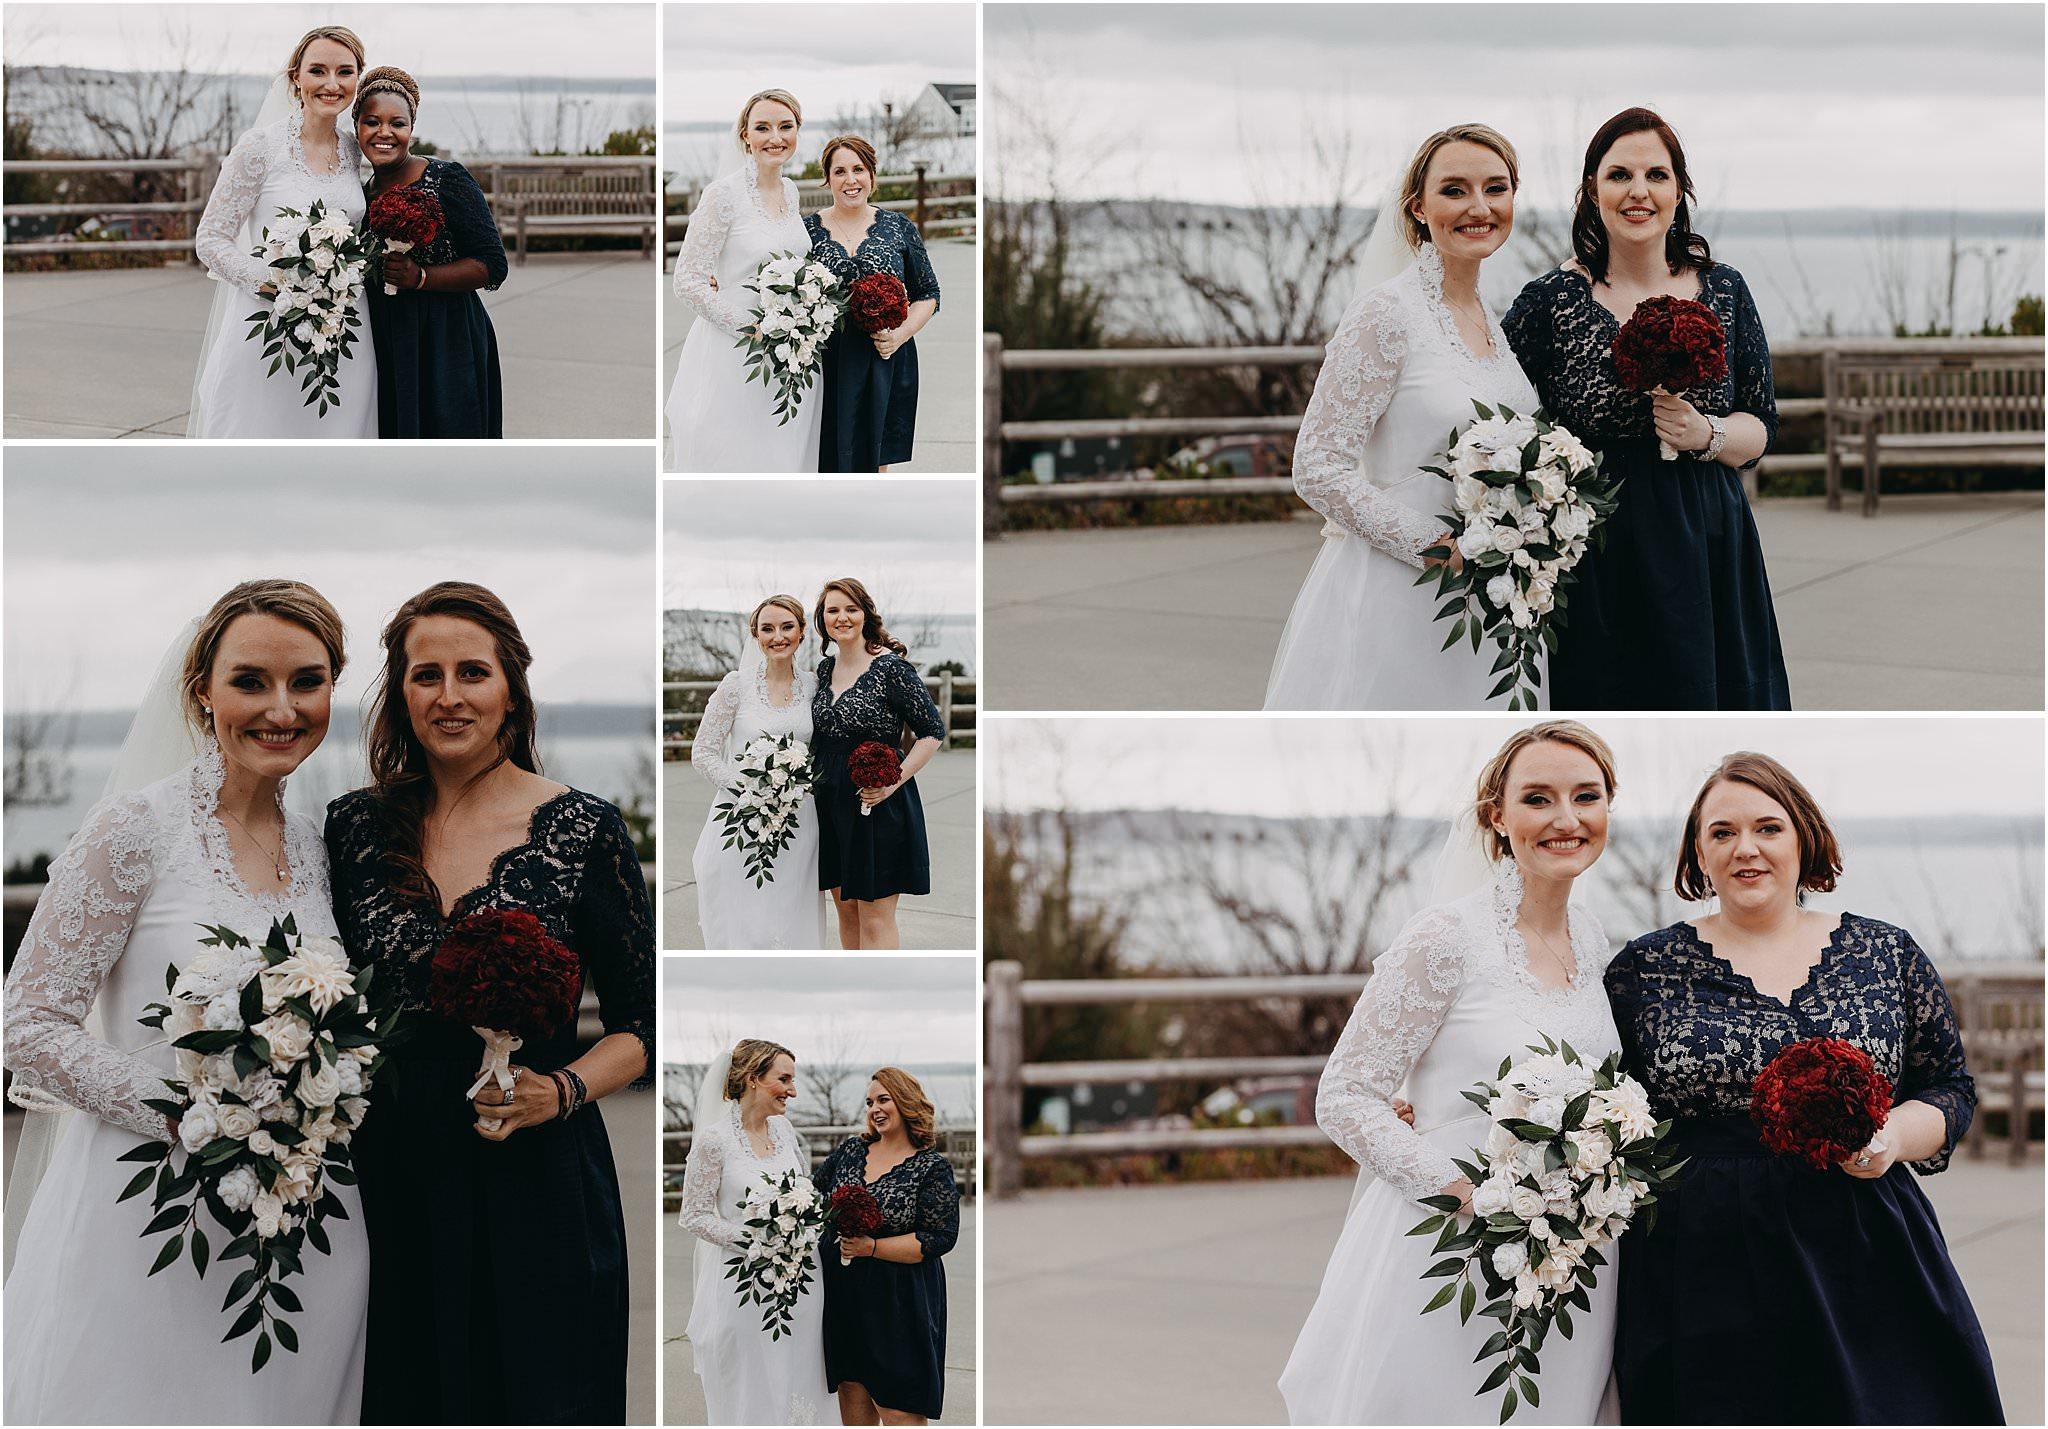 katy-robin-married-in-mukilteo-wedding26.jpg